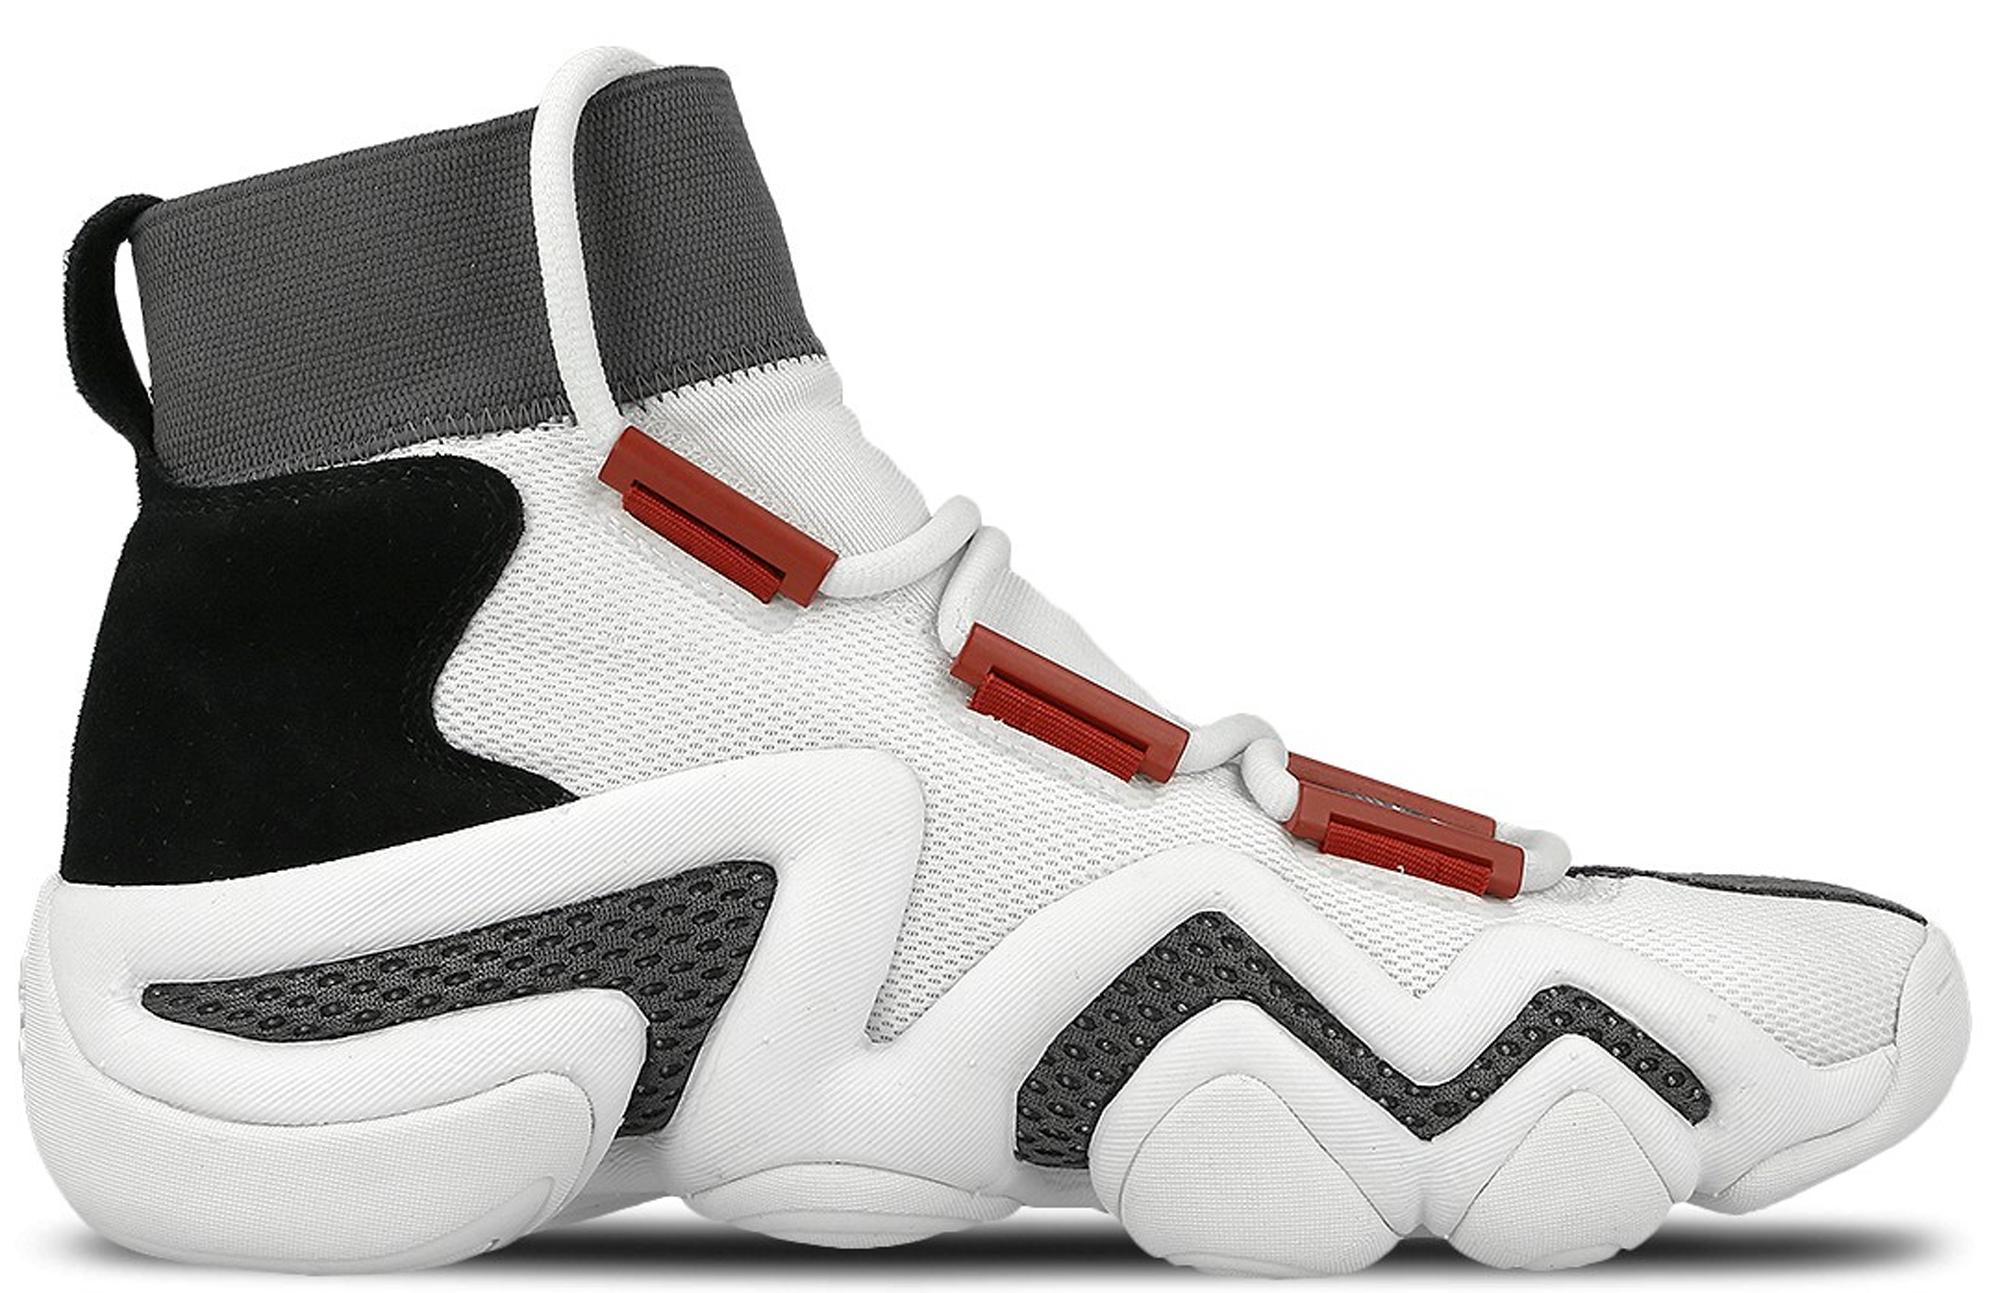 crazy 8s adidas cheap online